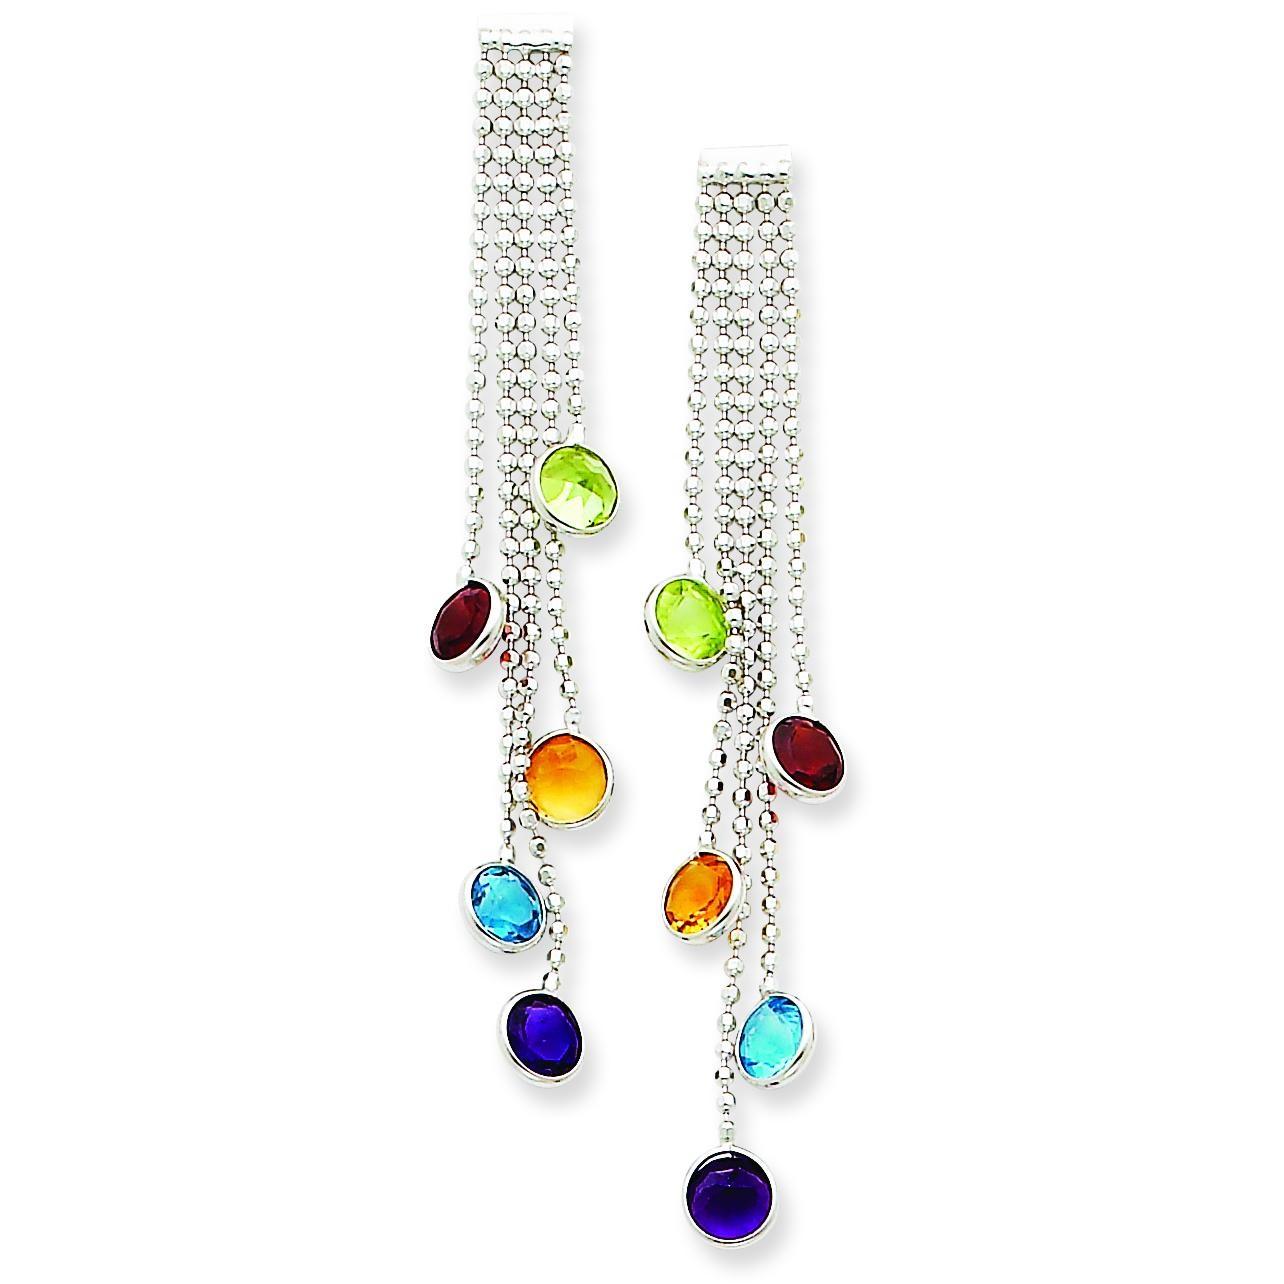 Multicolored Gemstone Dangle Earrings in 14k White Gold